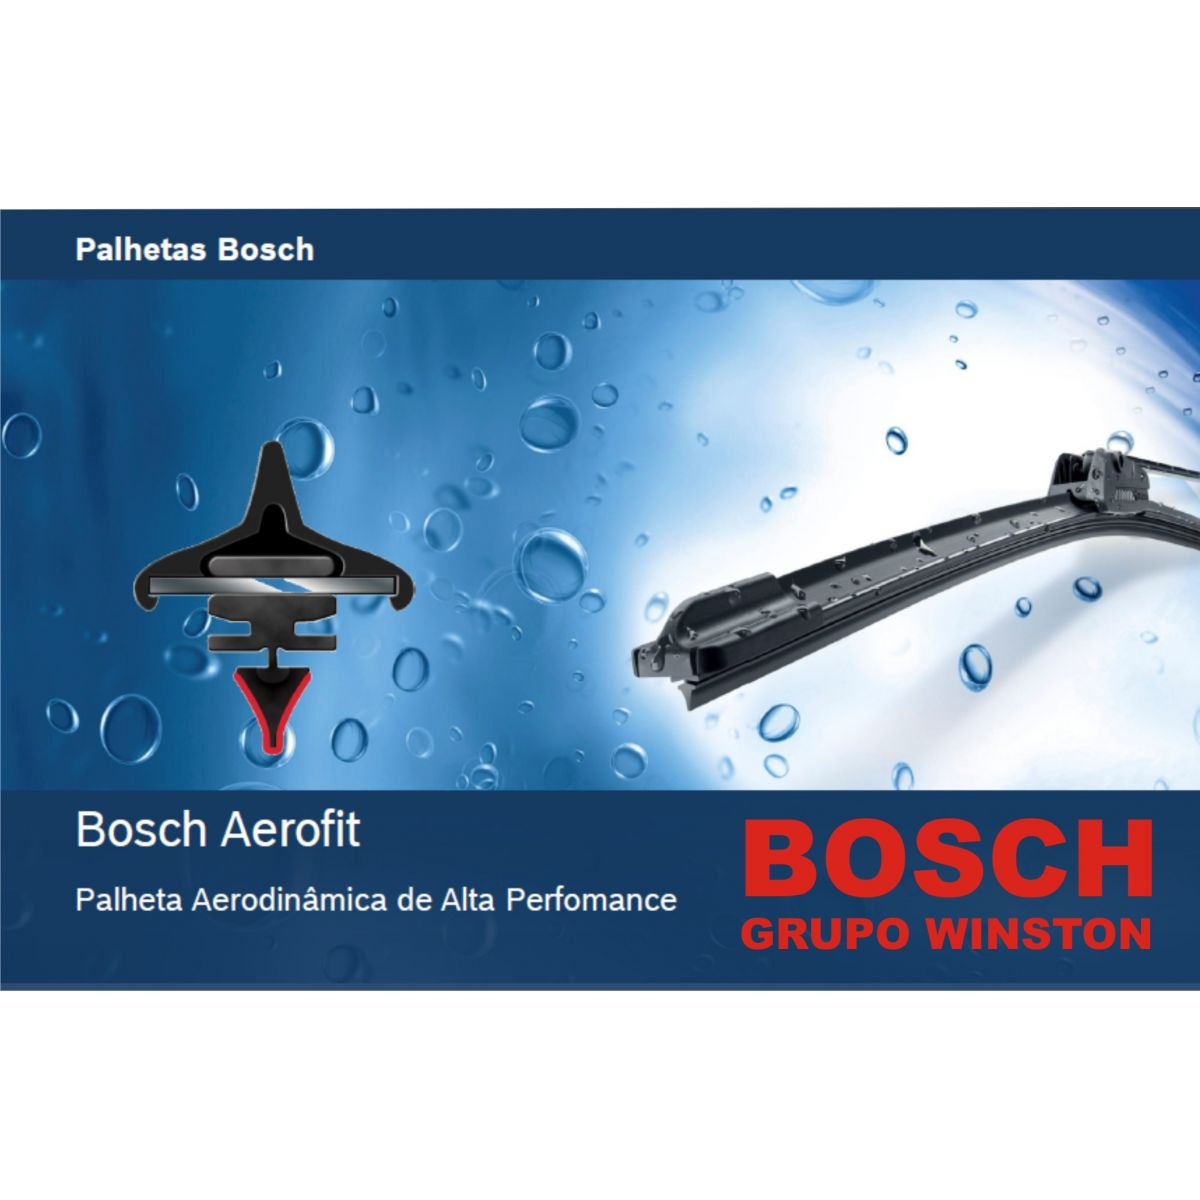 Palheta Bosch Aerofit Limpador de para brisa Bosch SEAT Inca